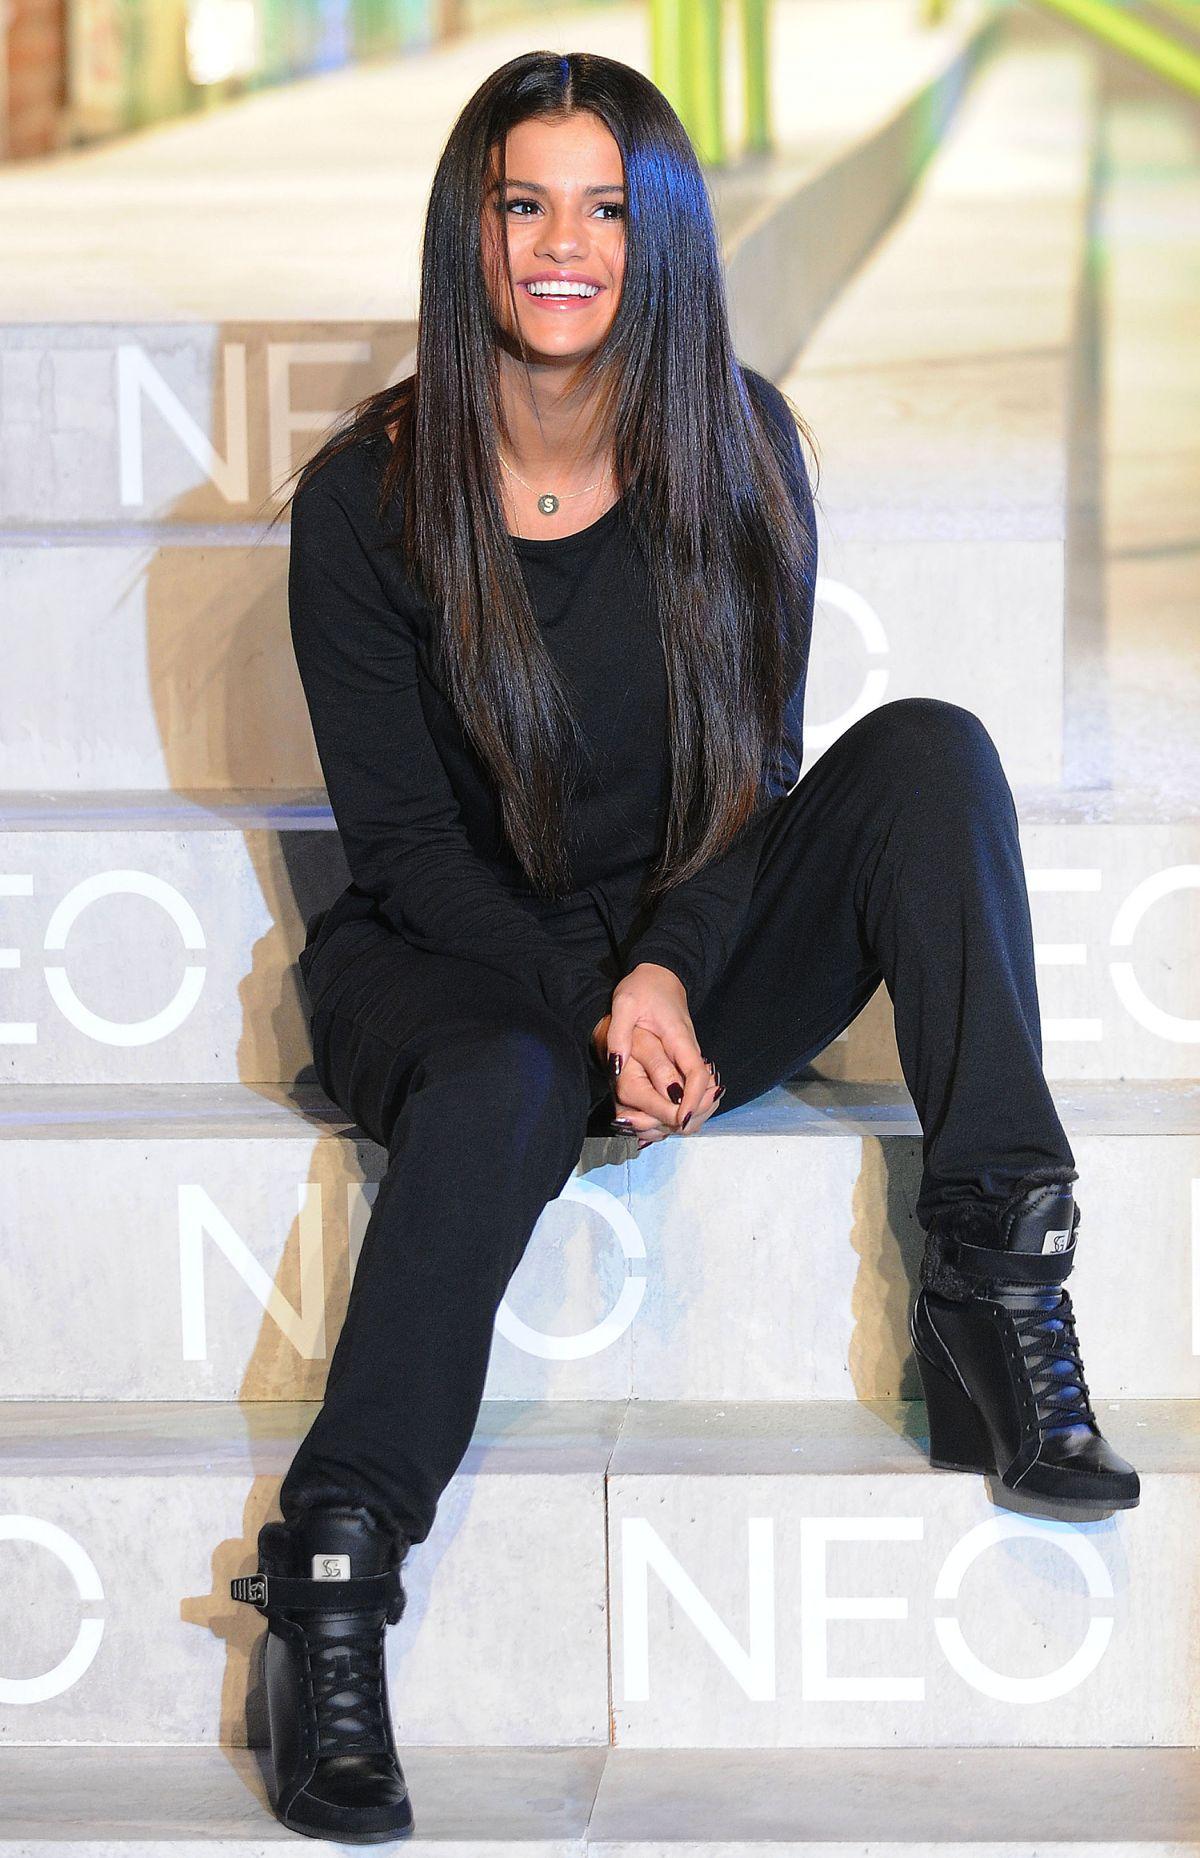 Produce puerta En particular  SELENA GOMEZ at 2014 Adidas Neo Fashion Show in New York – HawtCelebs